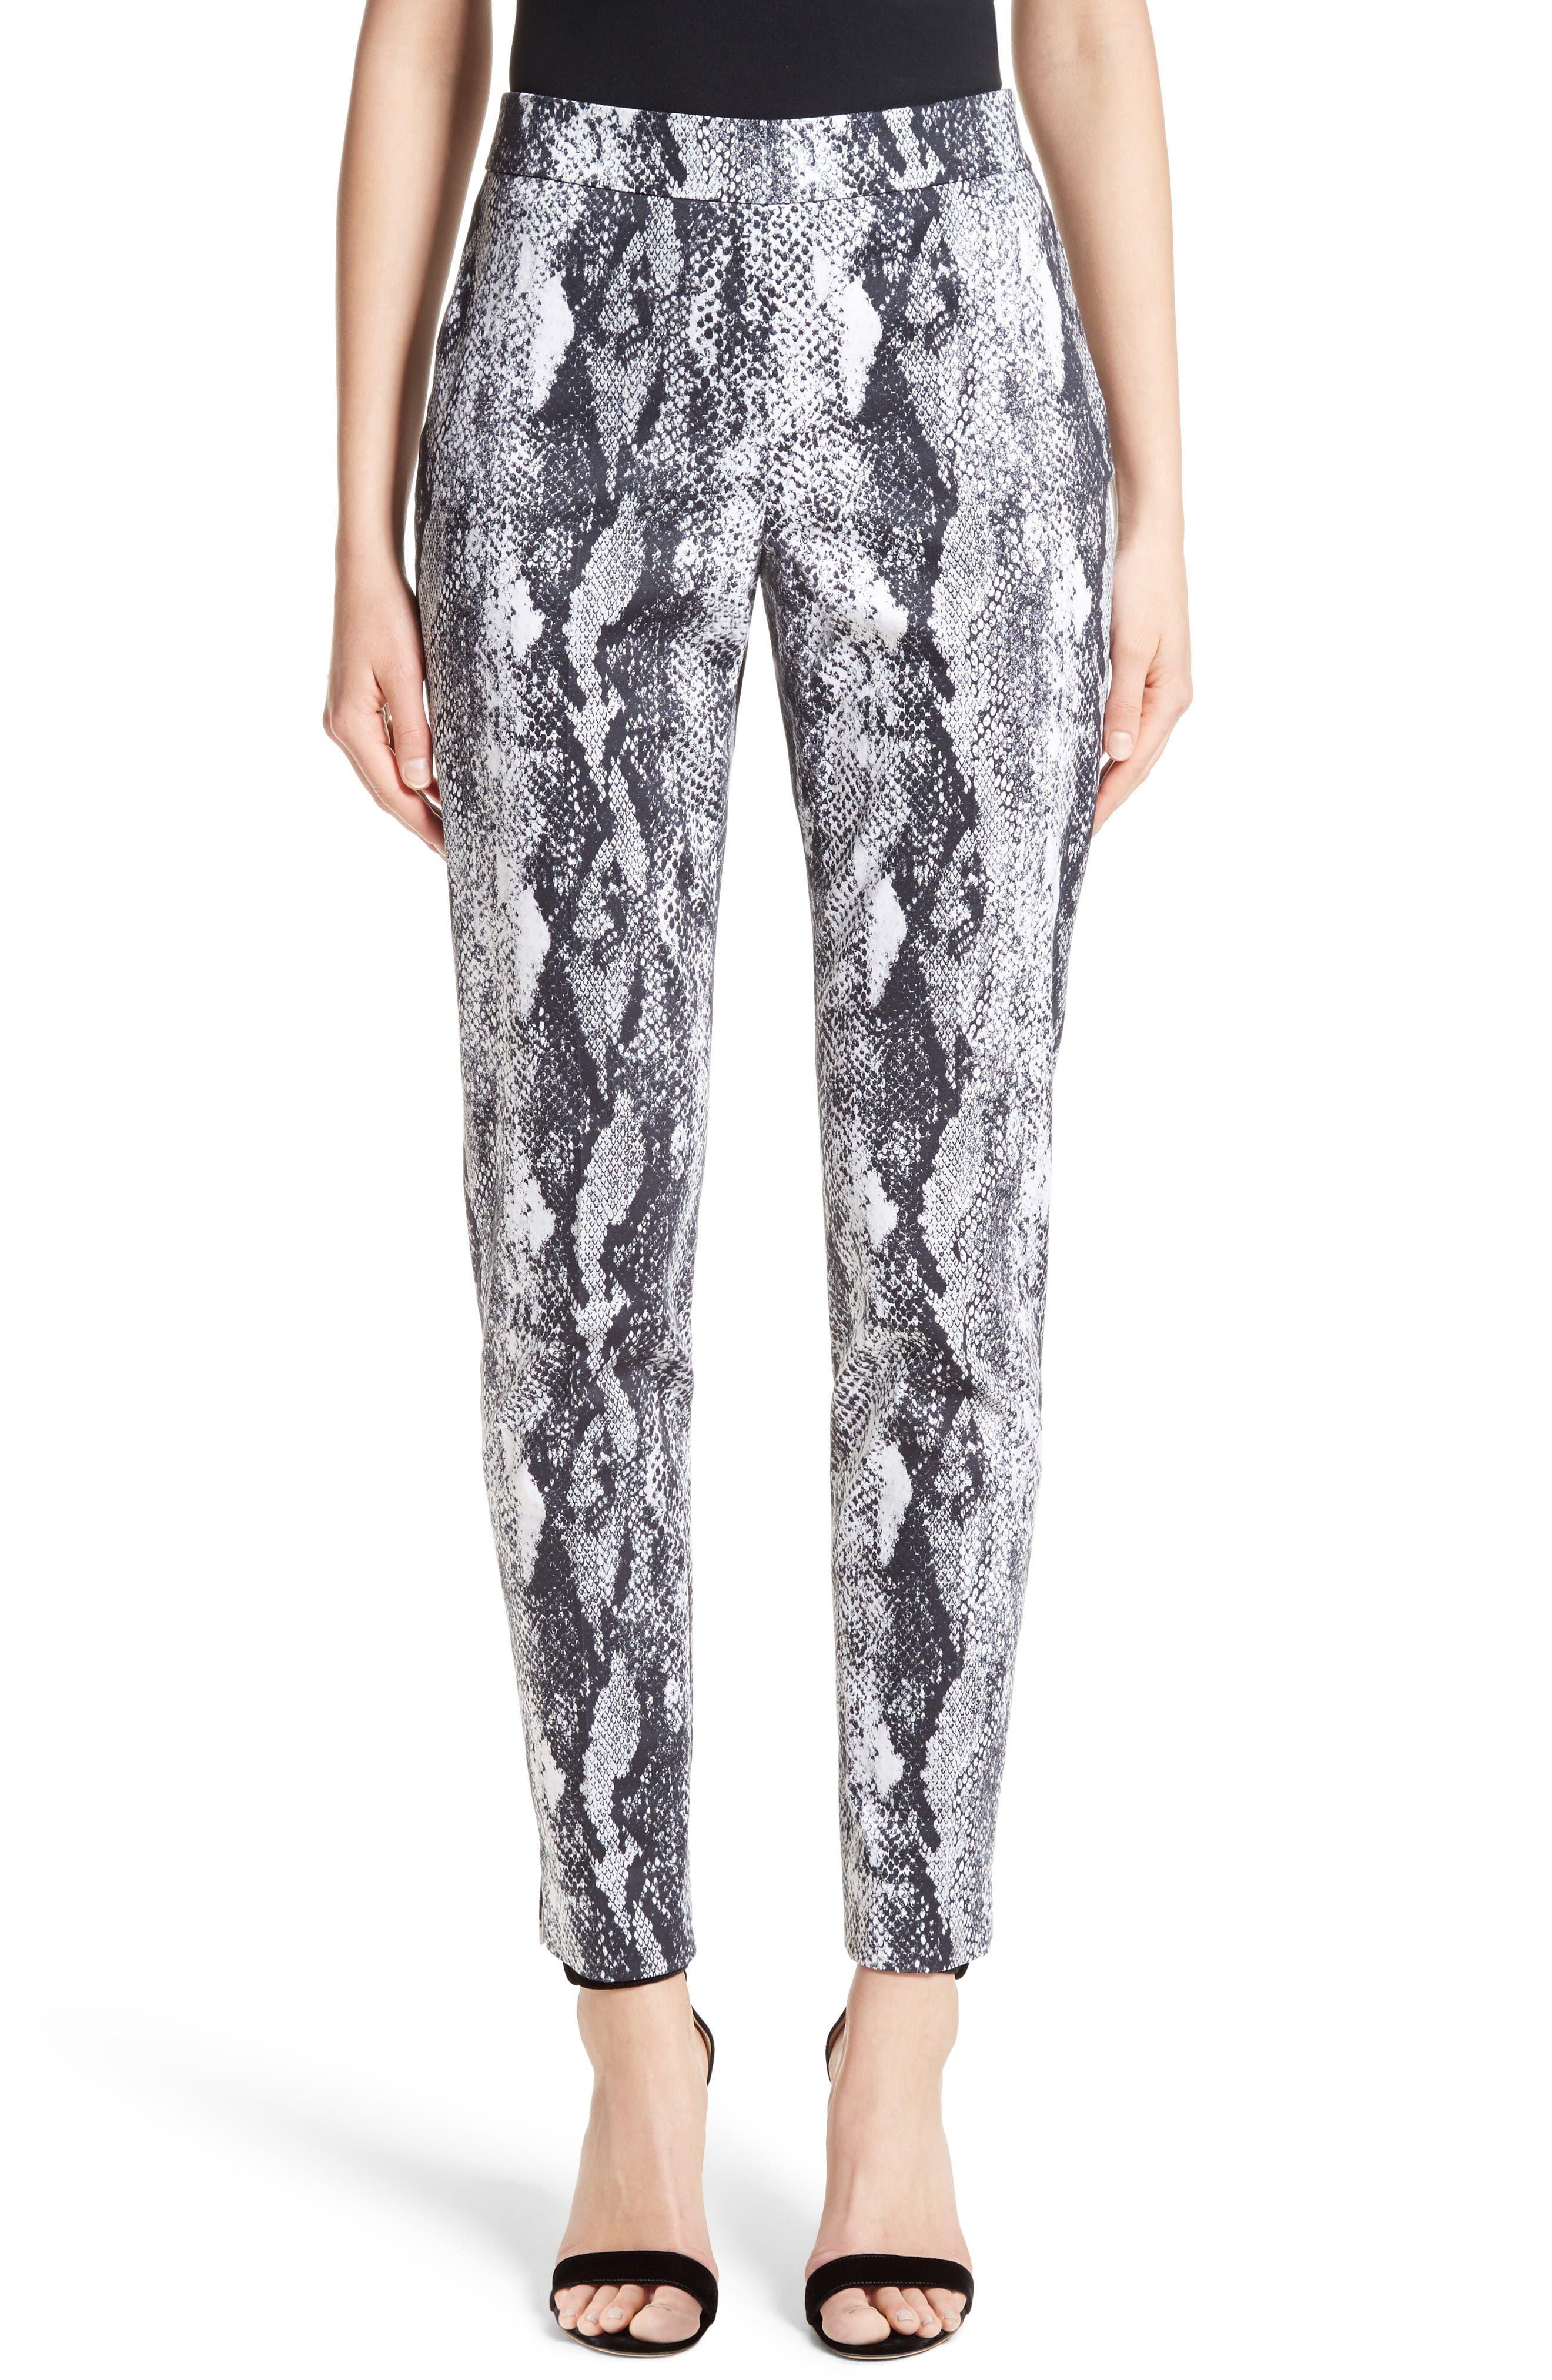 Emma Raja Snakeskin Print Pants,                         Main,                         color, Mica Multi